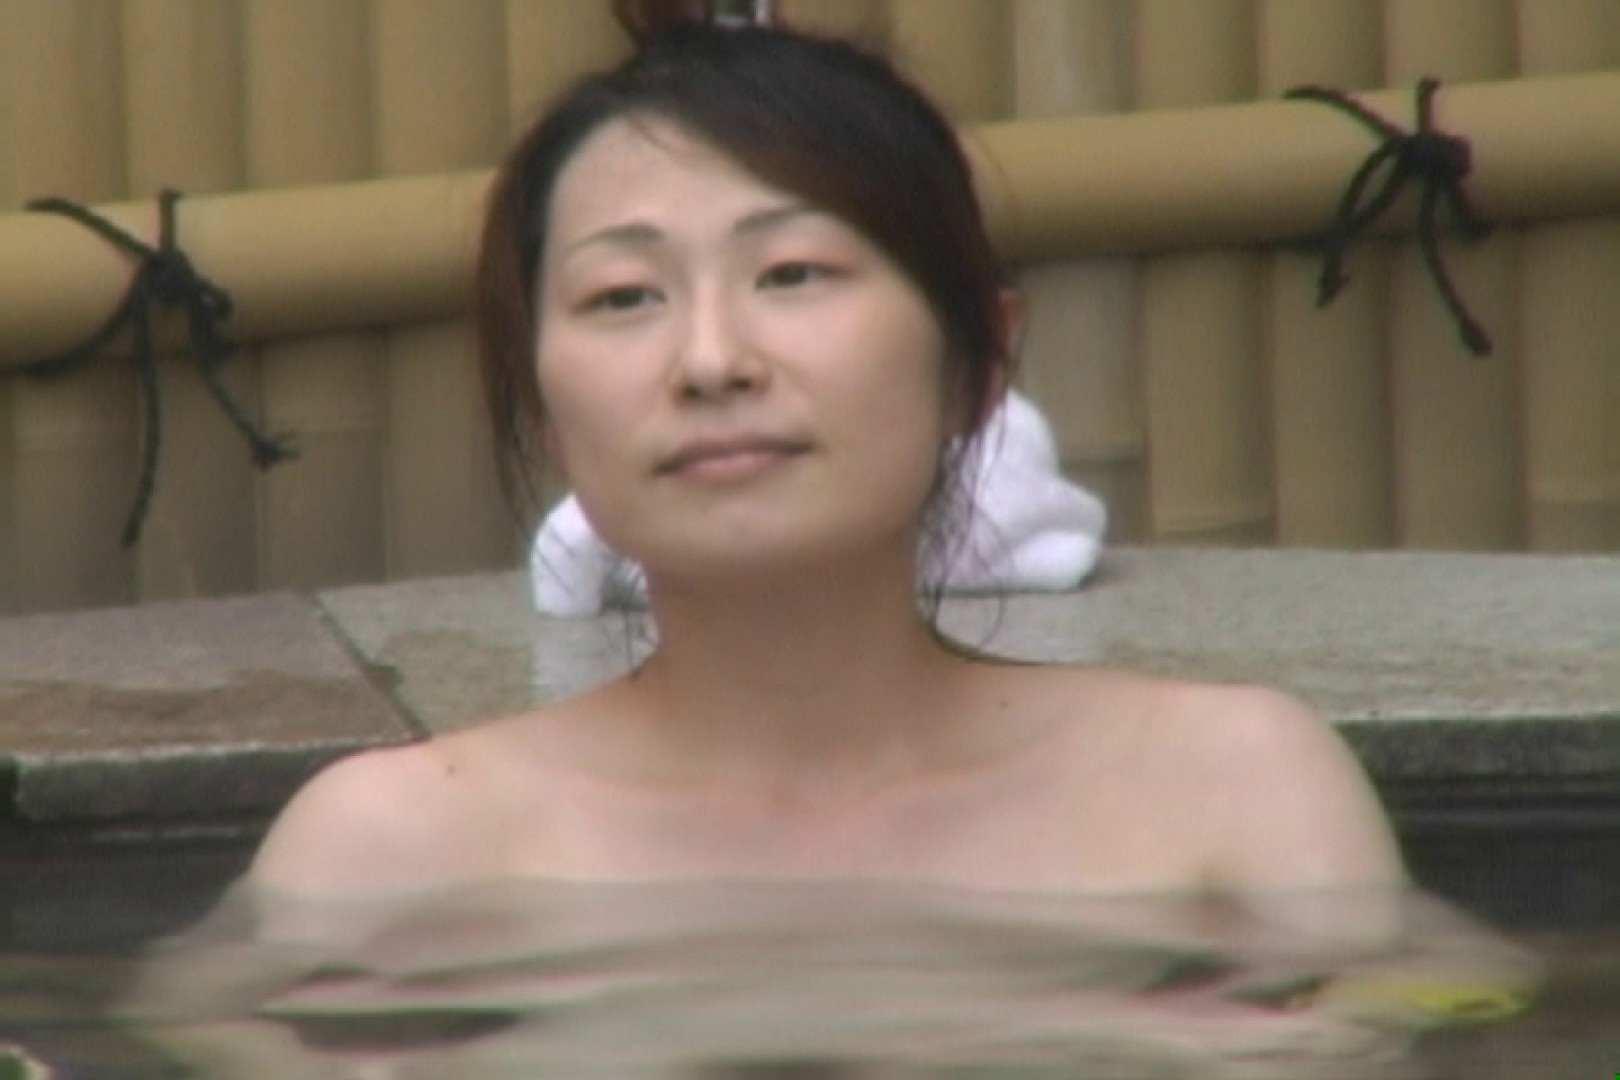 Aquaな露天風呂Vol.615 0  36連発 18